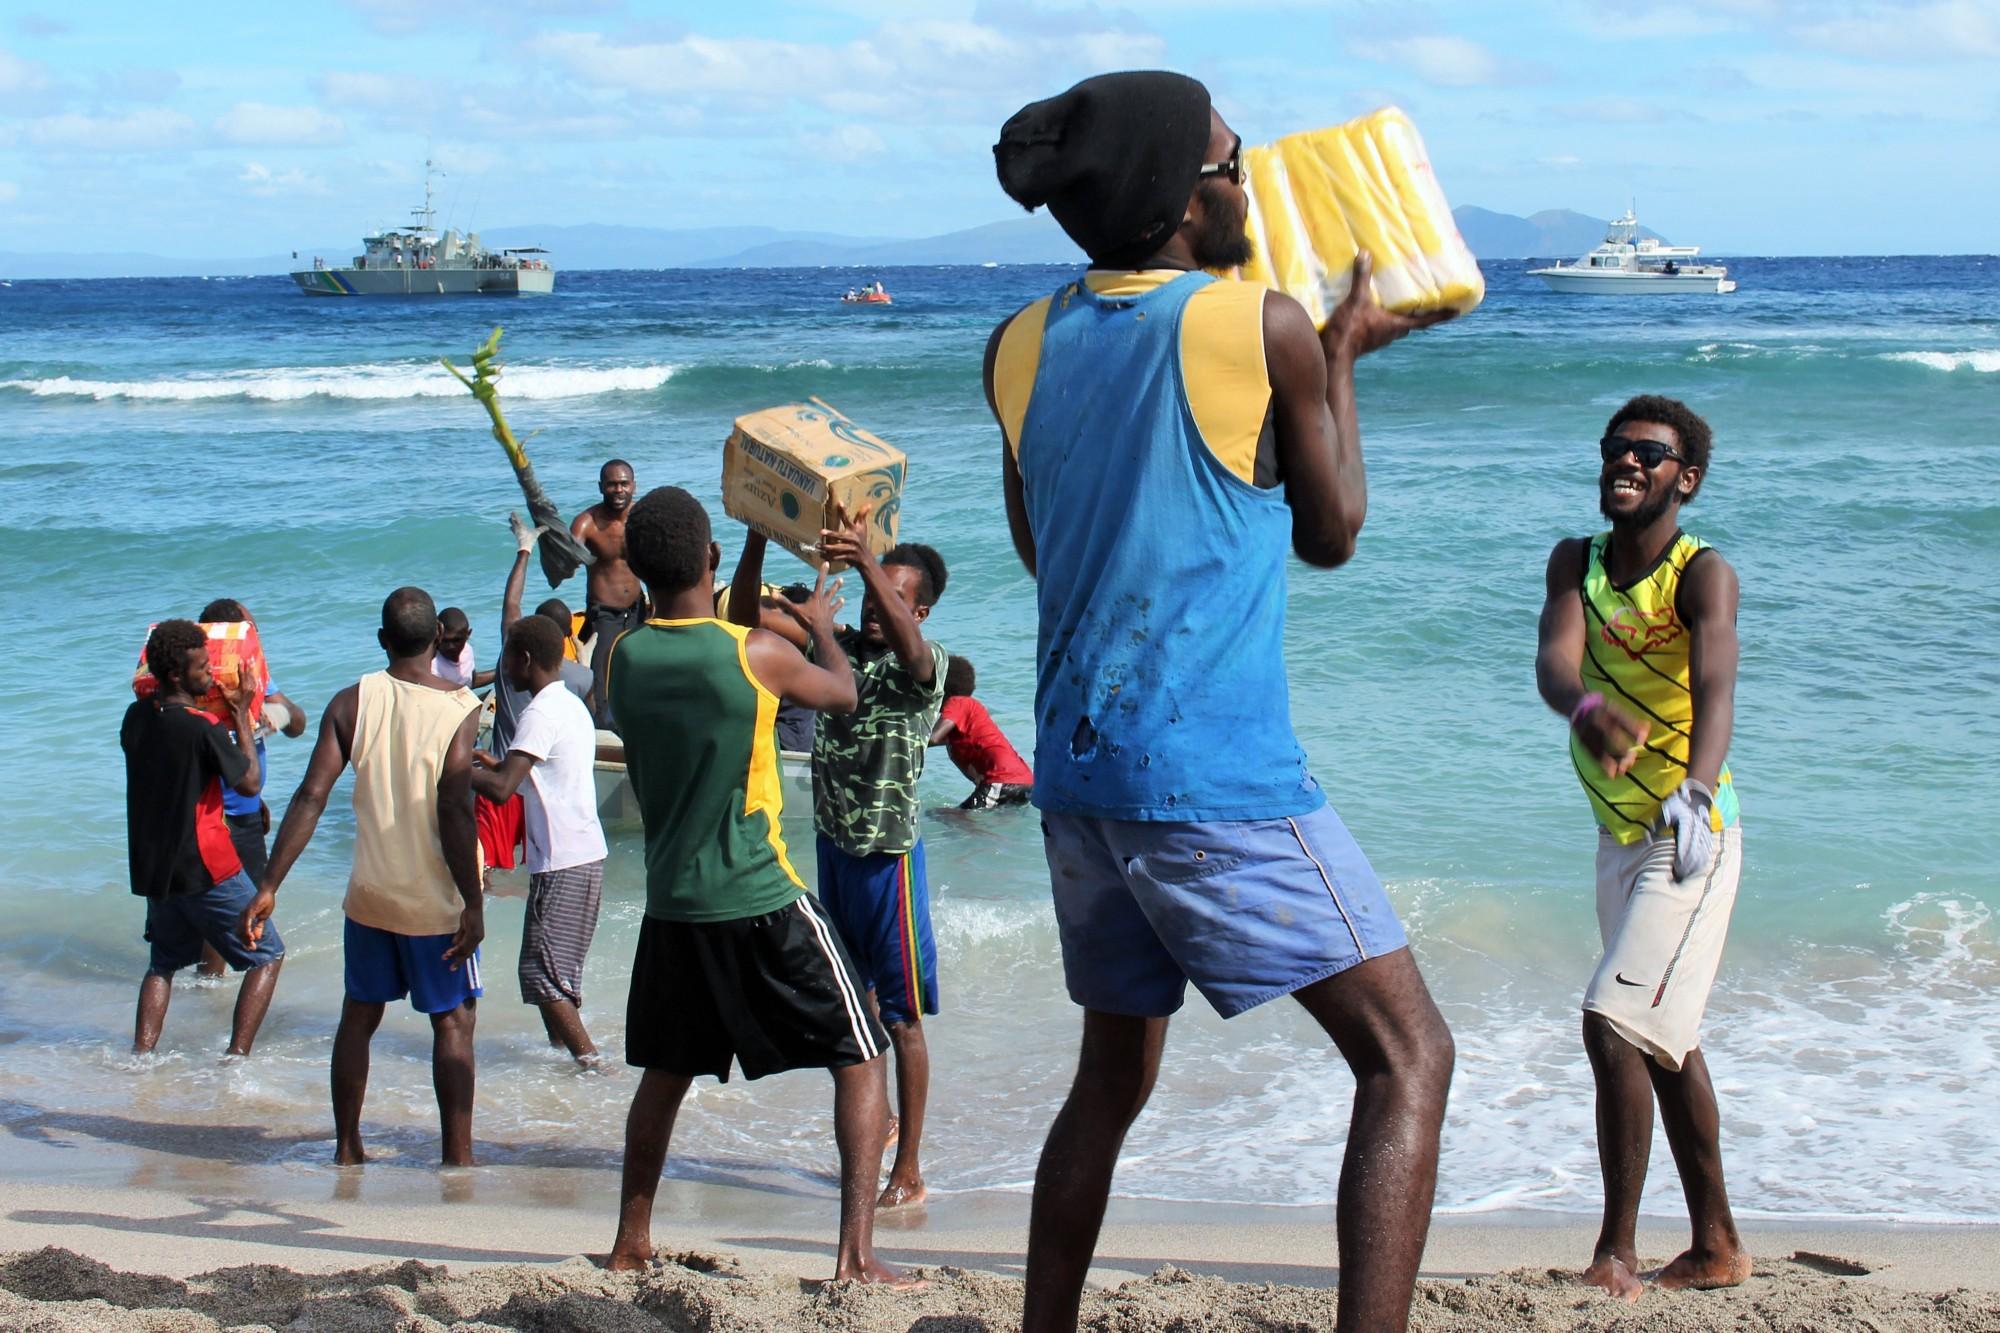 Community Members unloading food supplies and NFI kits in Mataso Island, Vanuatu (Alberto Preato /IOM)